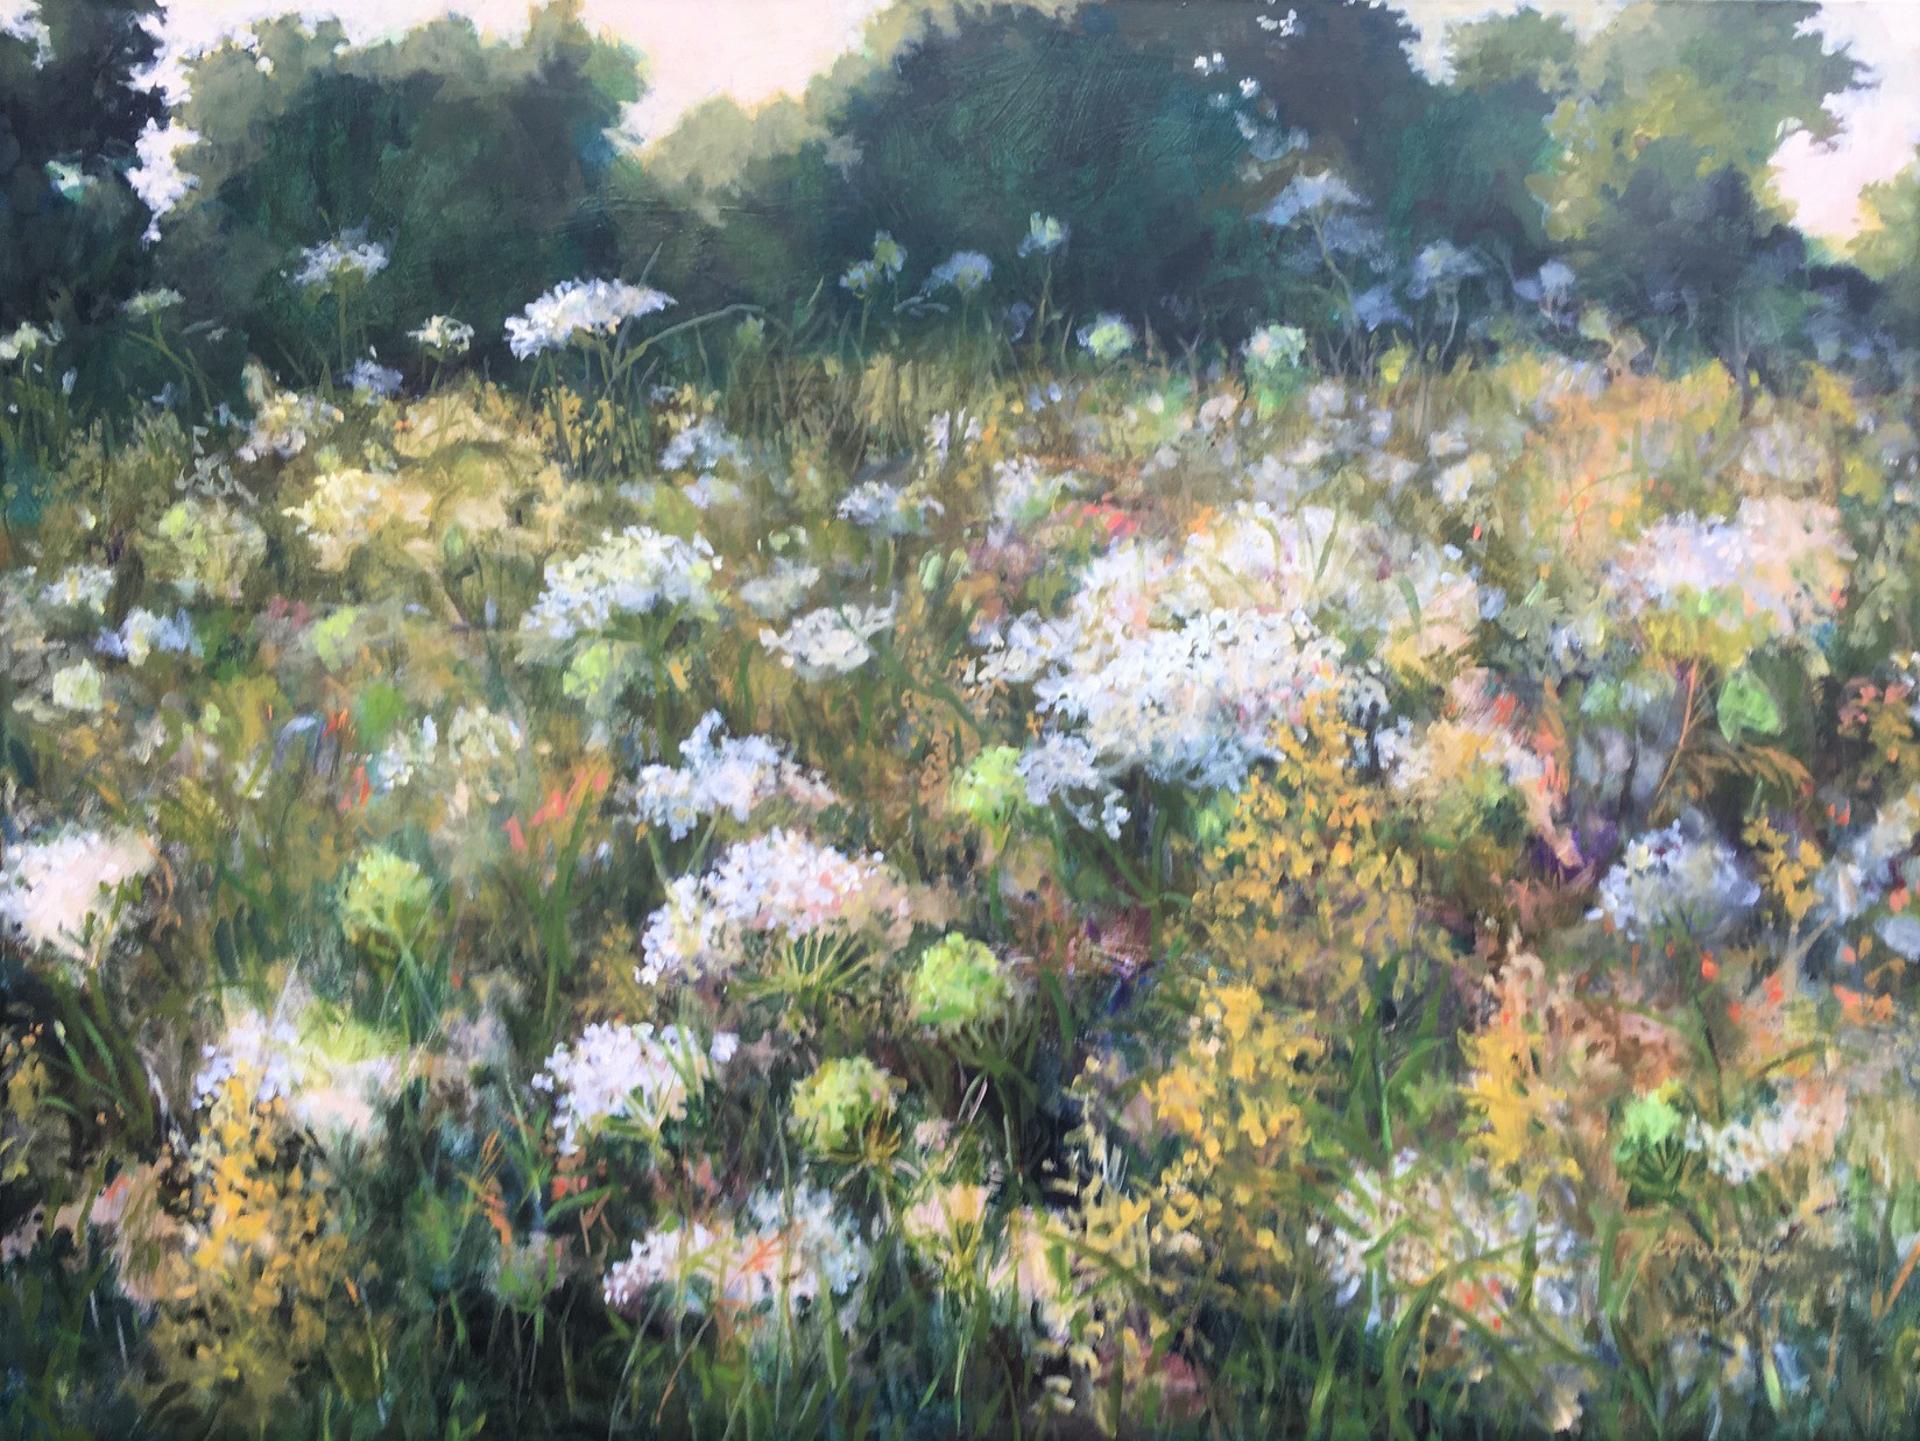 Field of Wildflowers by Nan Cunningham